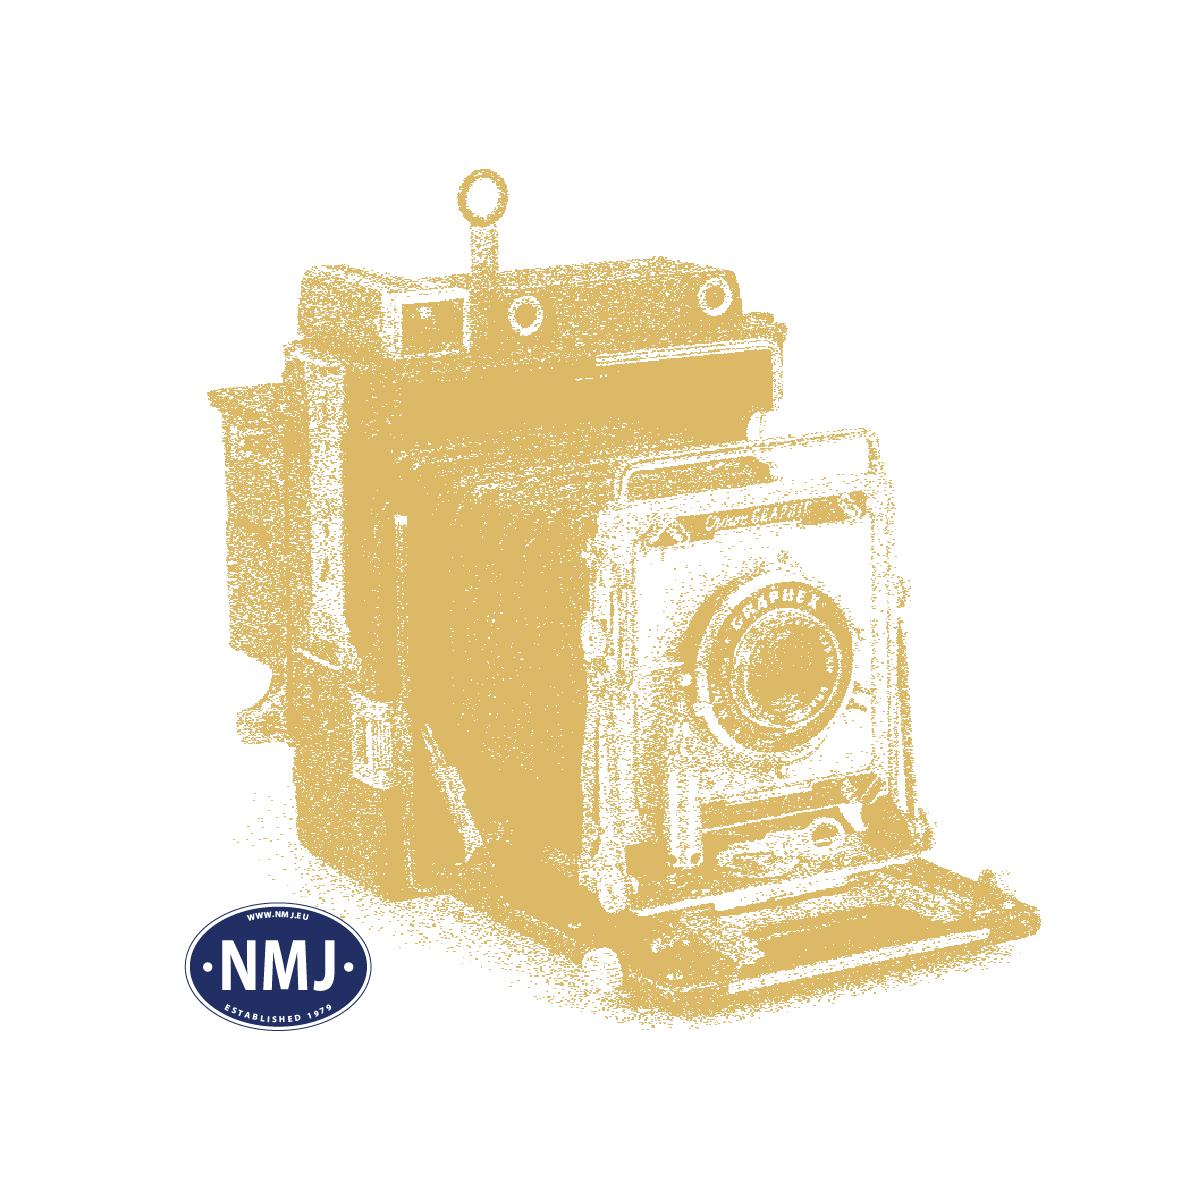 MBR55-1007 - Gressmatte #7, 30 x 40 Cm